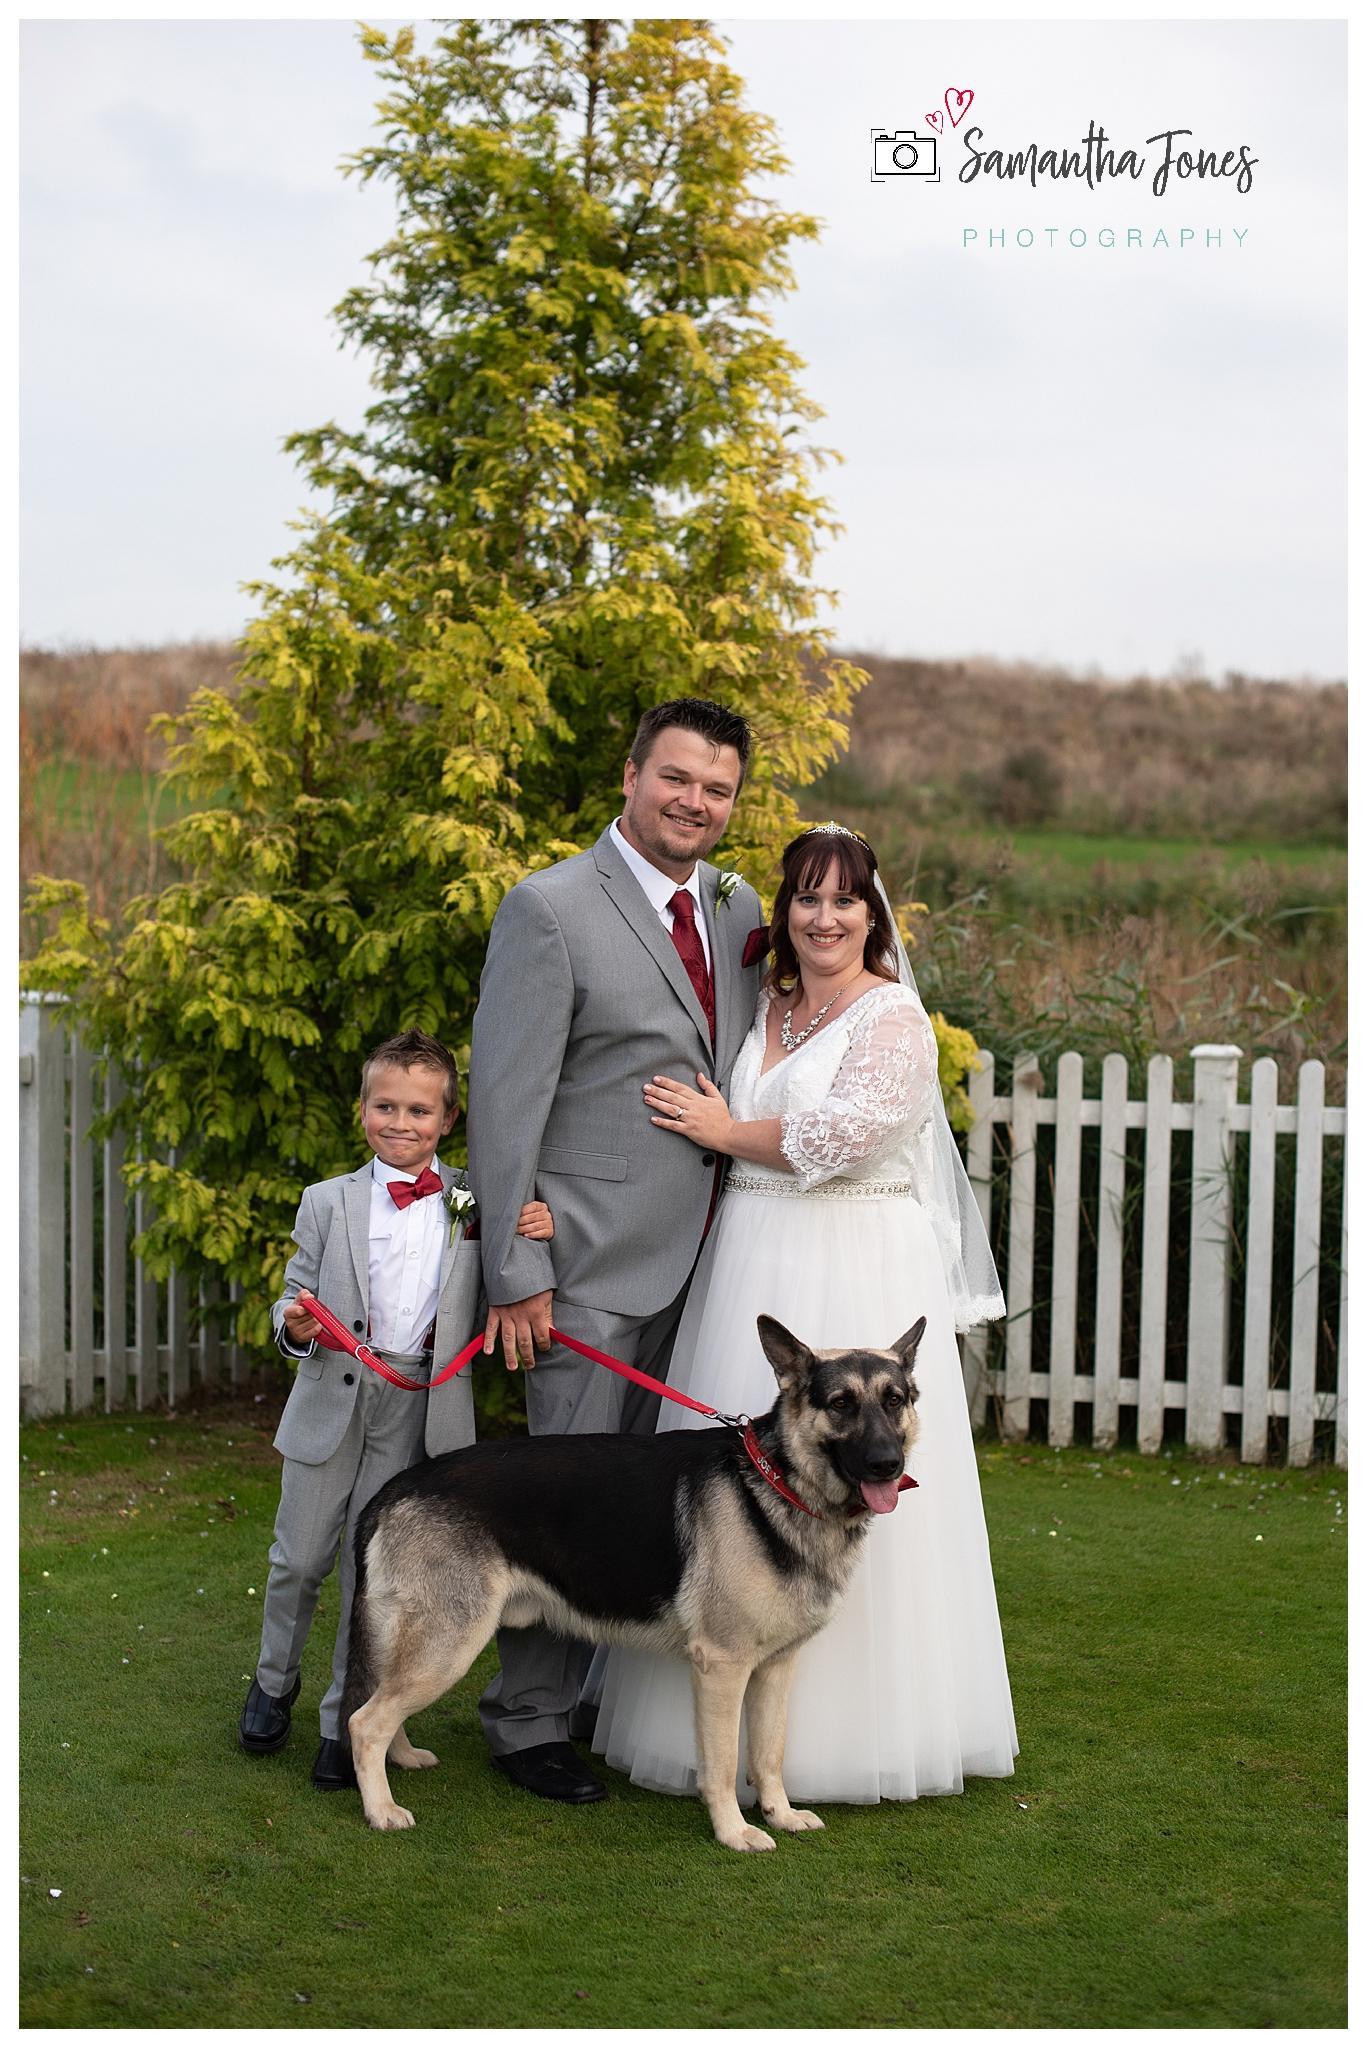 Kent twilight October wedding at Stonelees